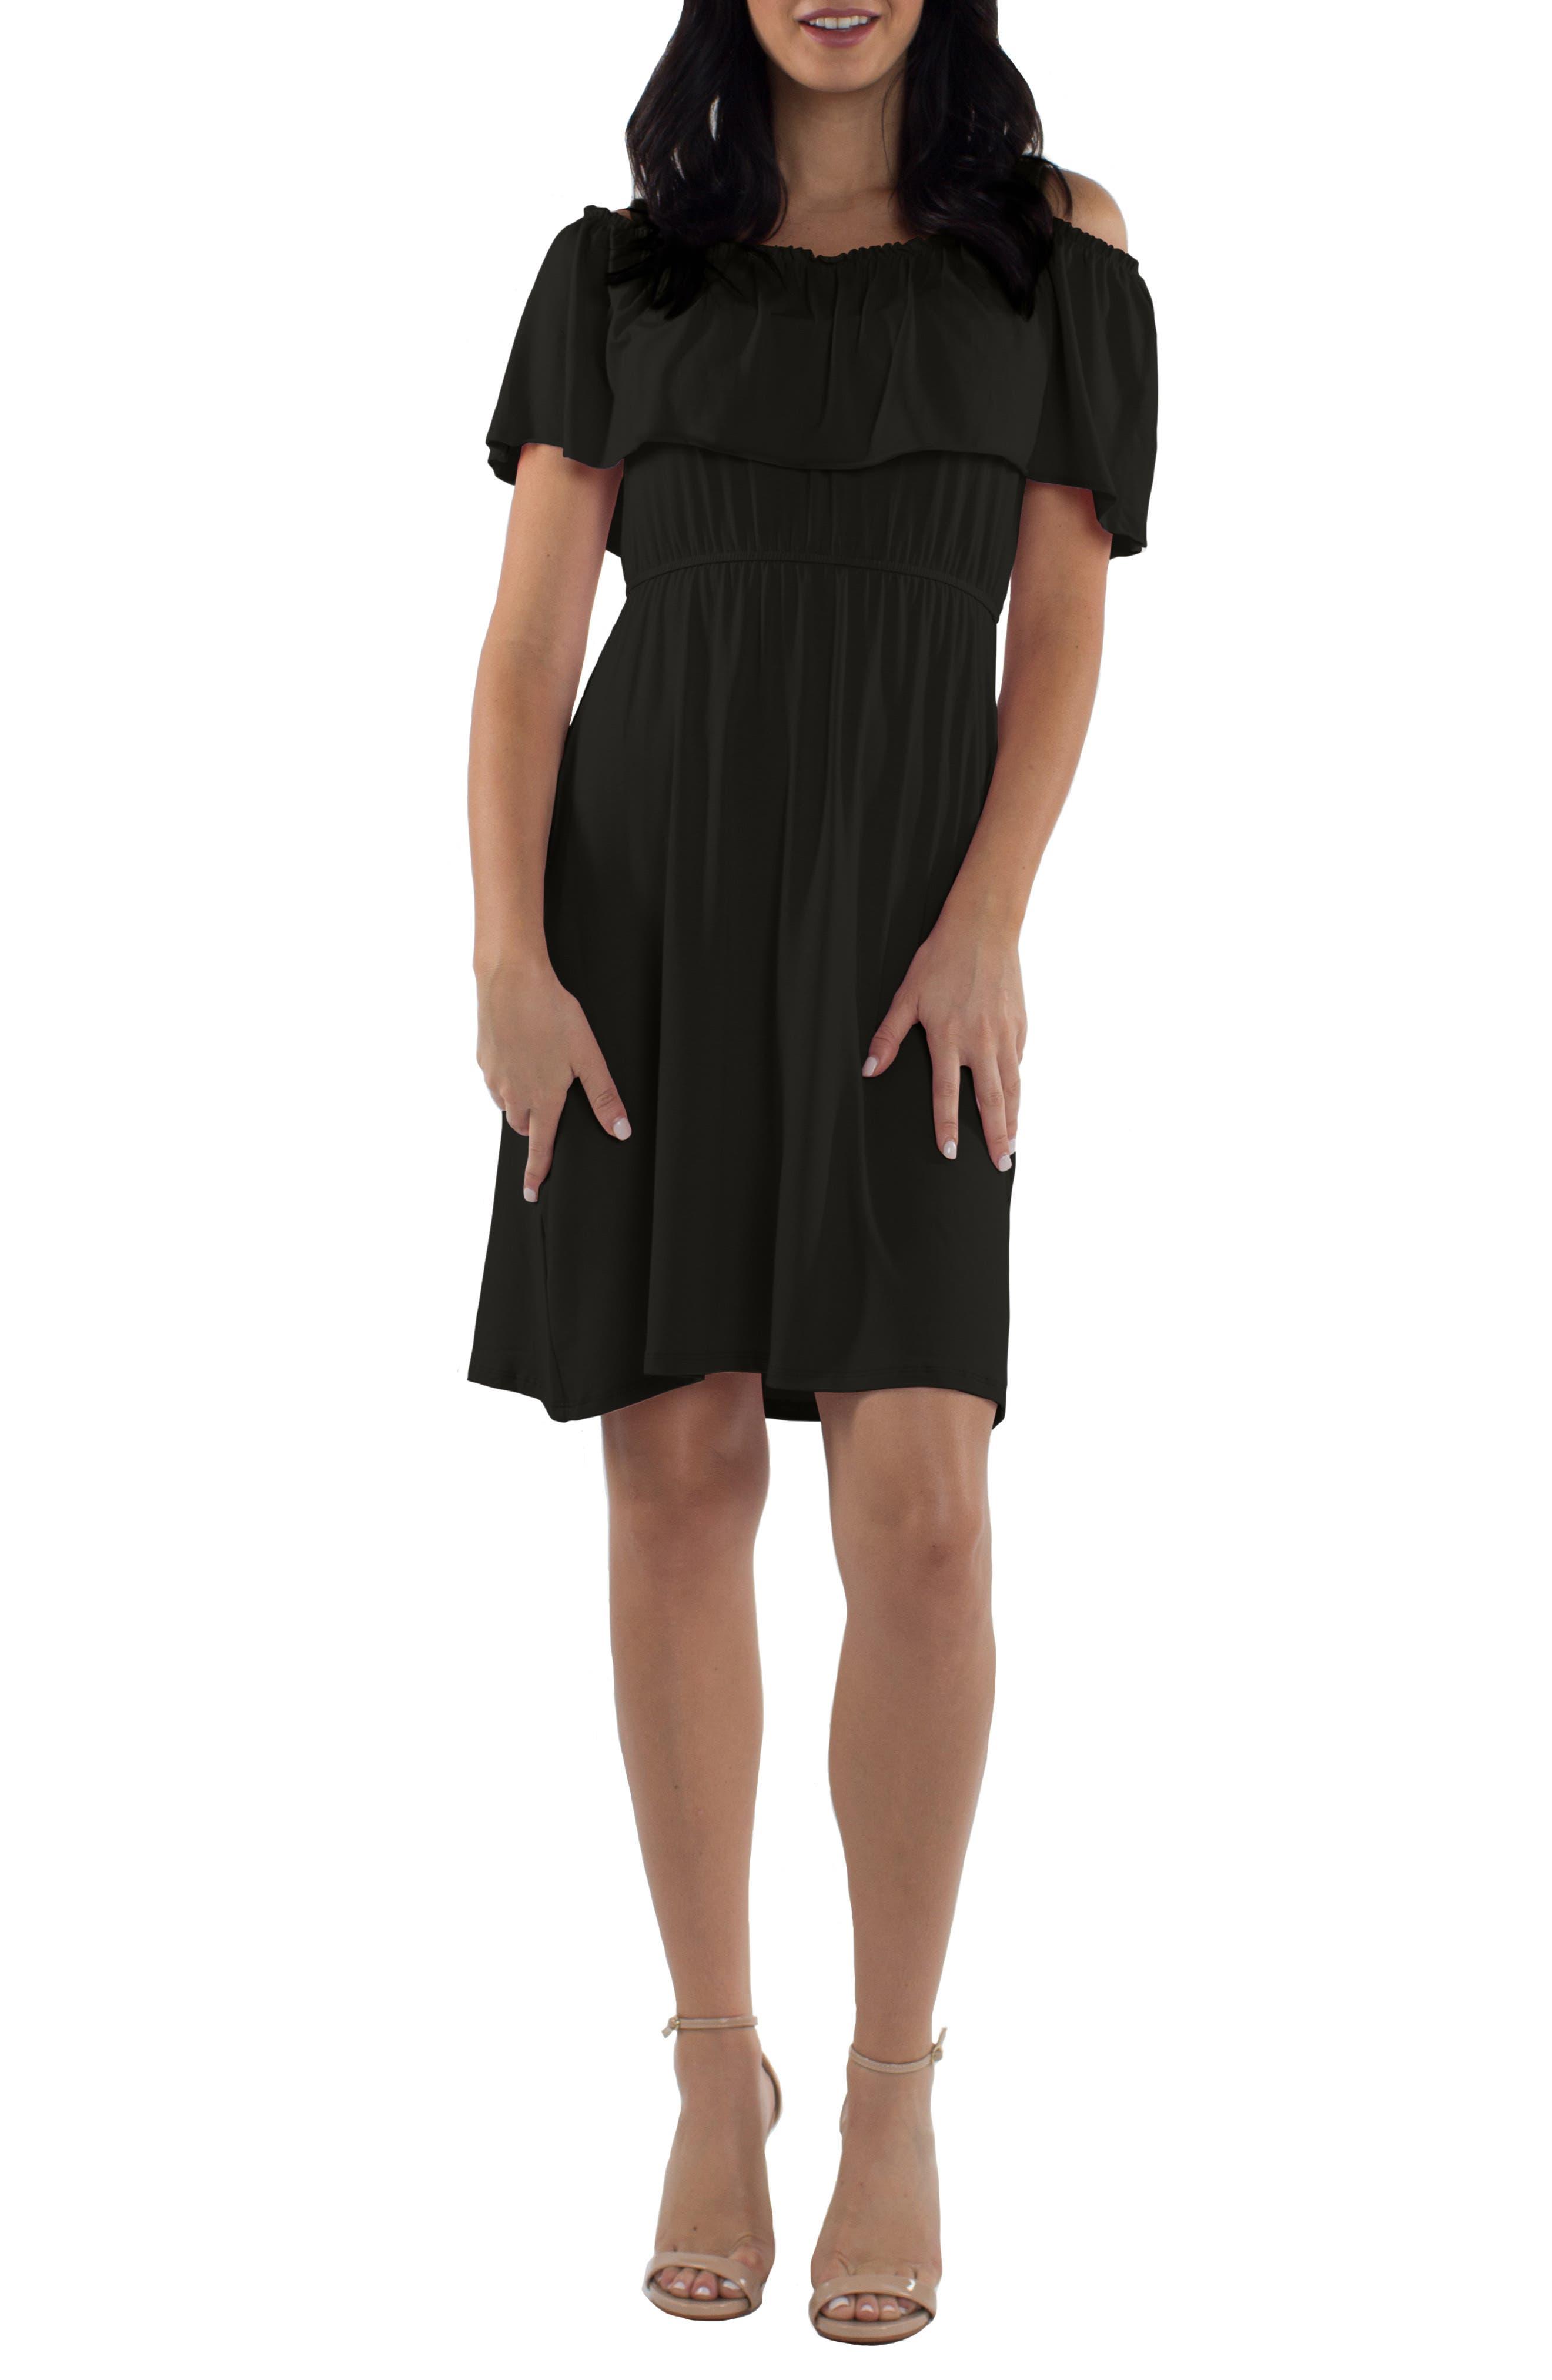 Udderly Hot Mama Reagan Maternity/nursing Dress, Black